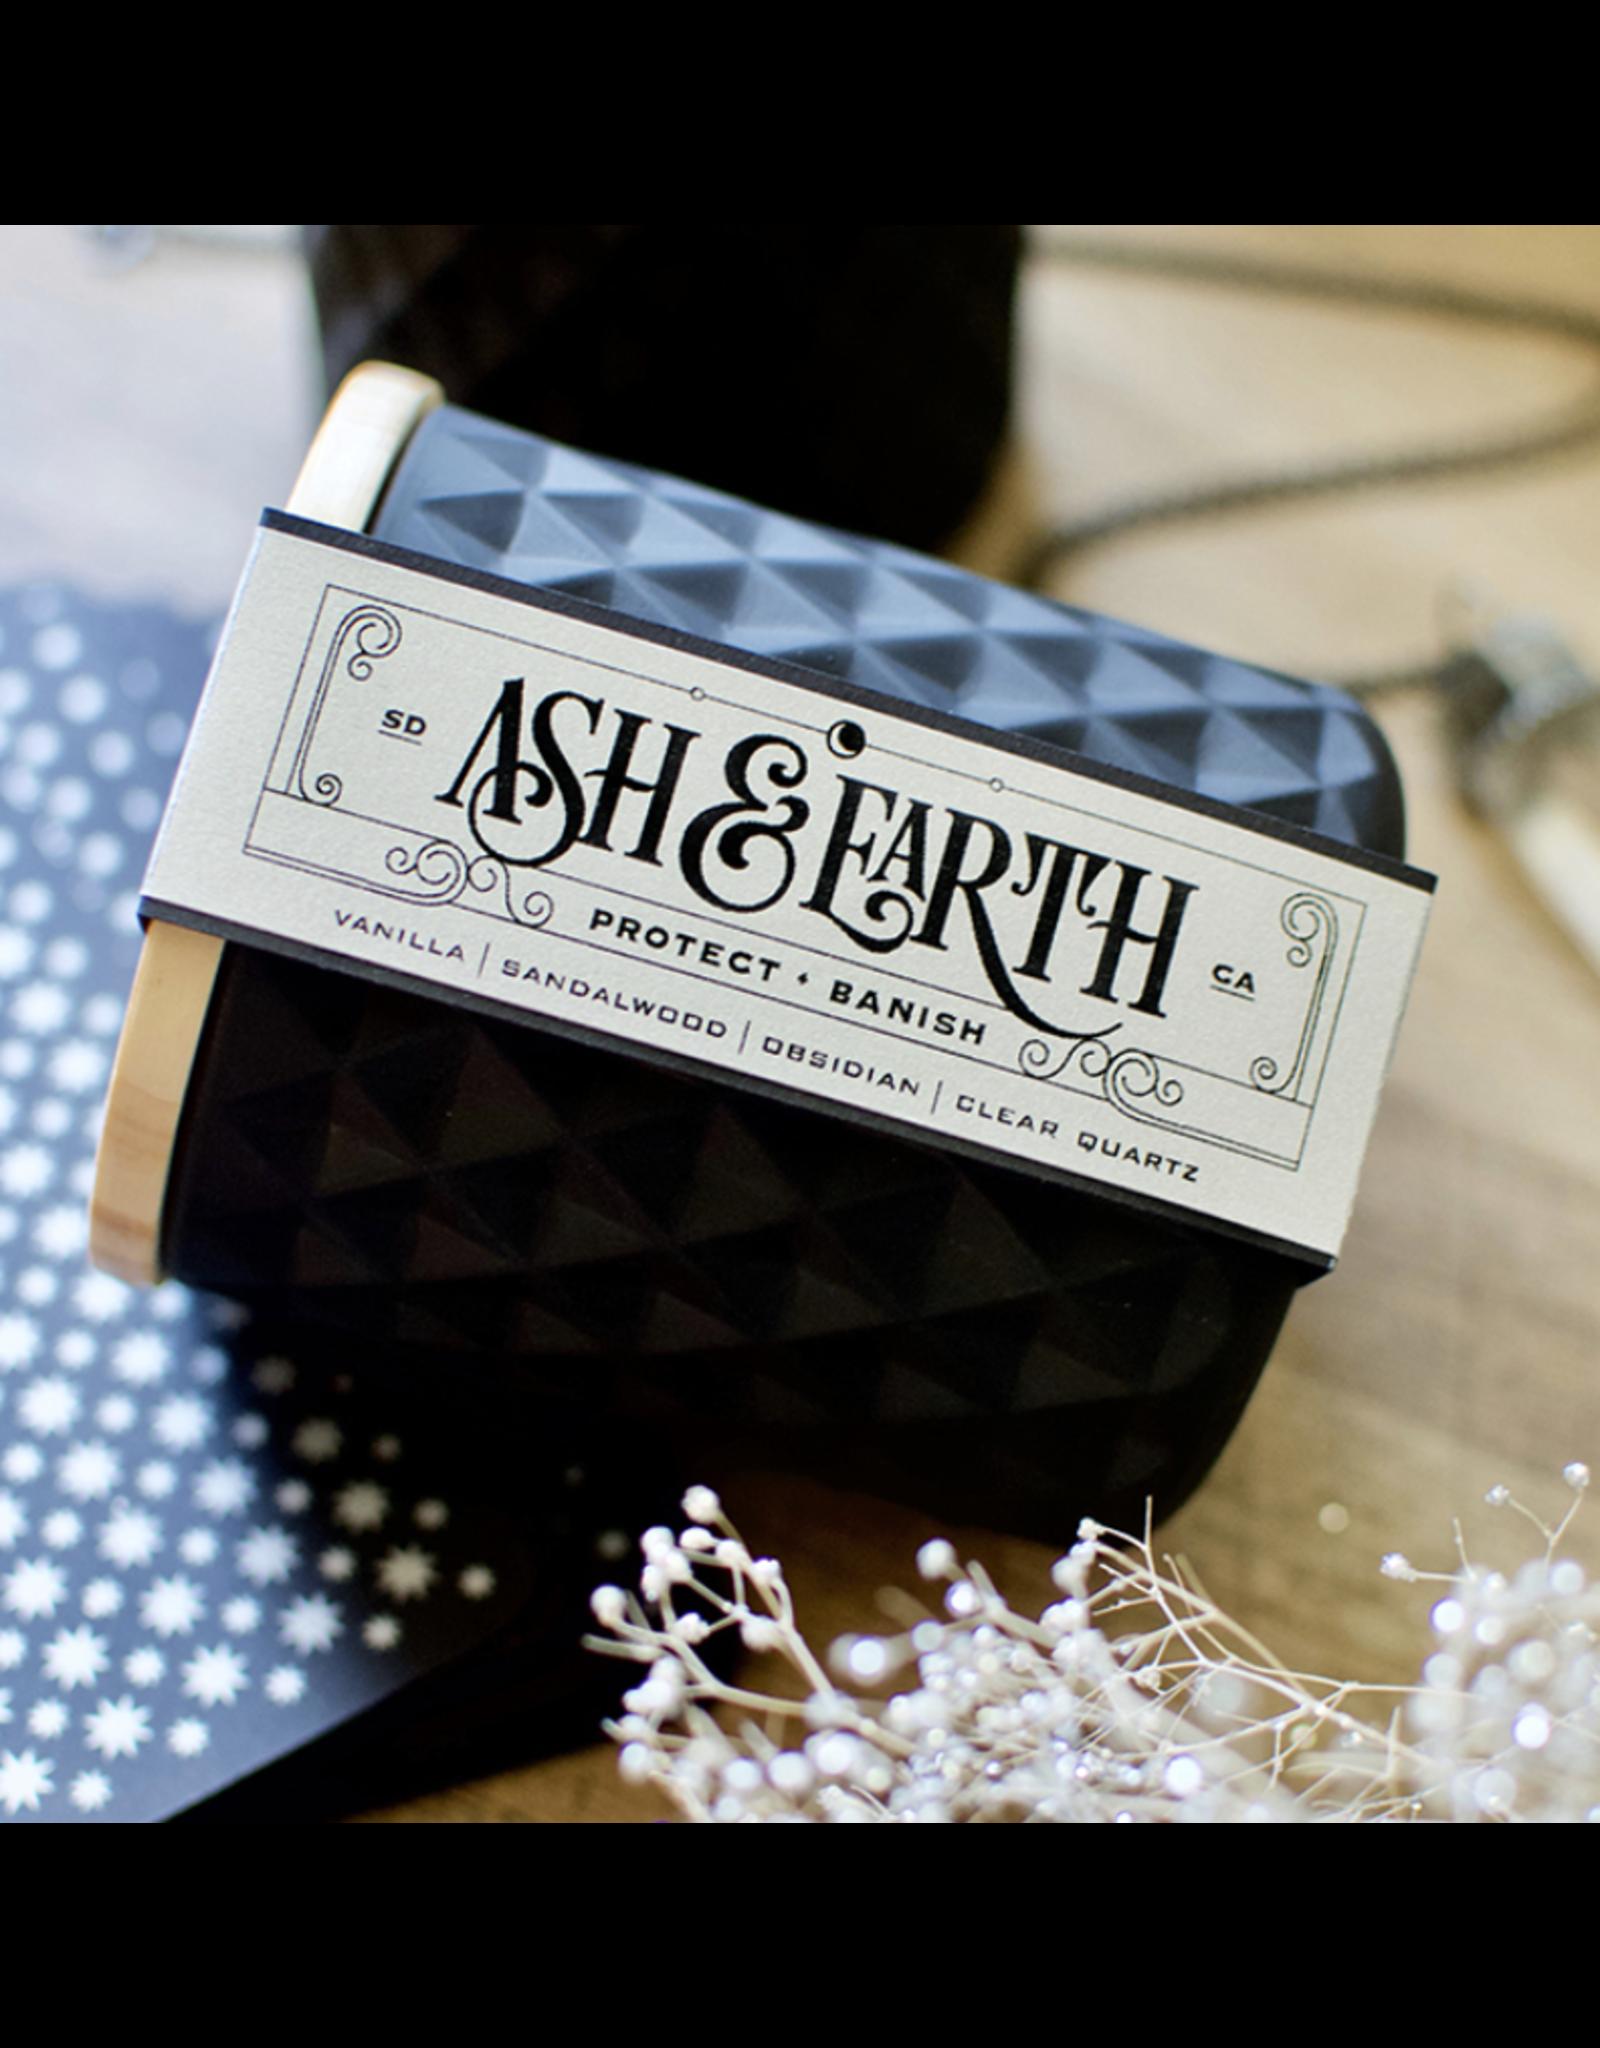 Ash & Earth New Moon Ritual Candle – Protect & Banish